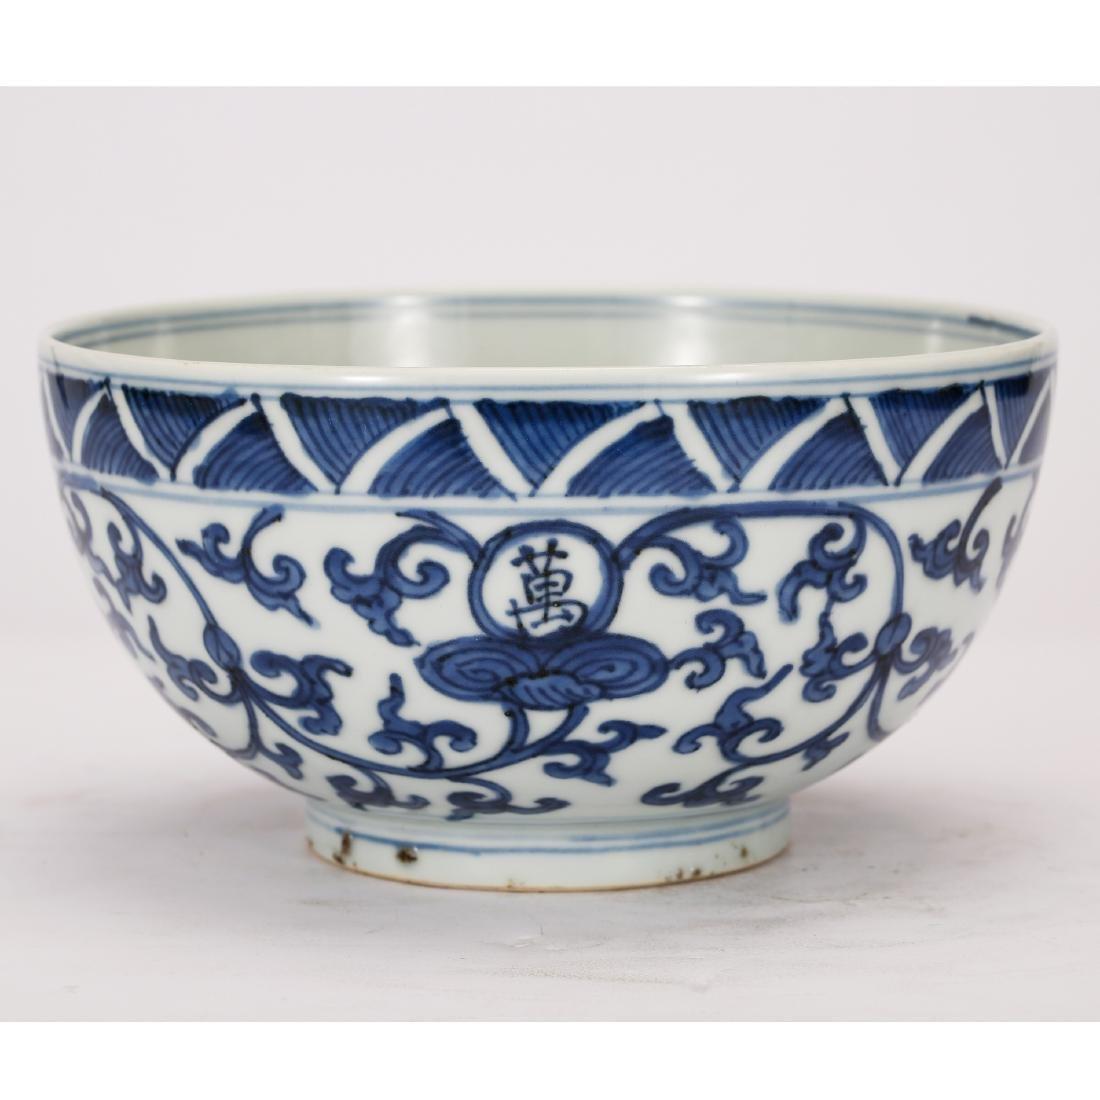 CHINESE BLUE AND WHITE FOLIAGE BOWL